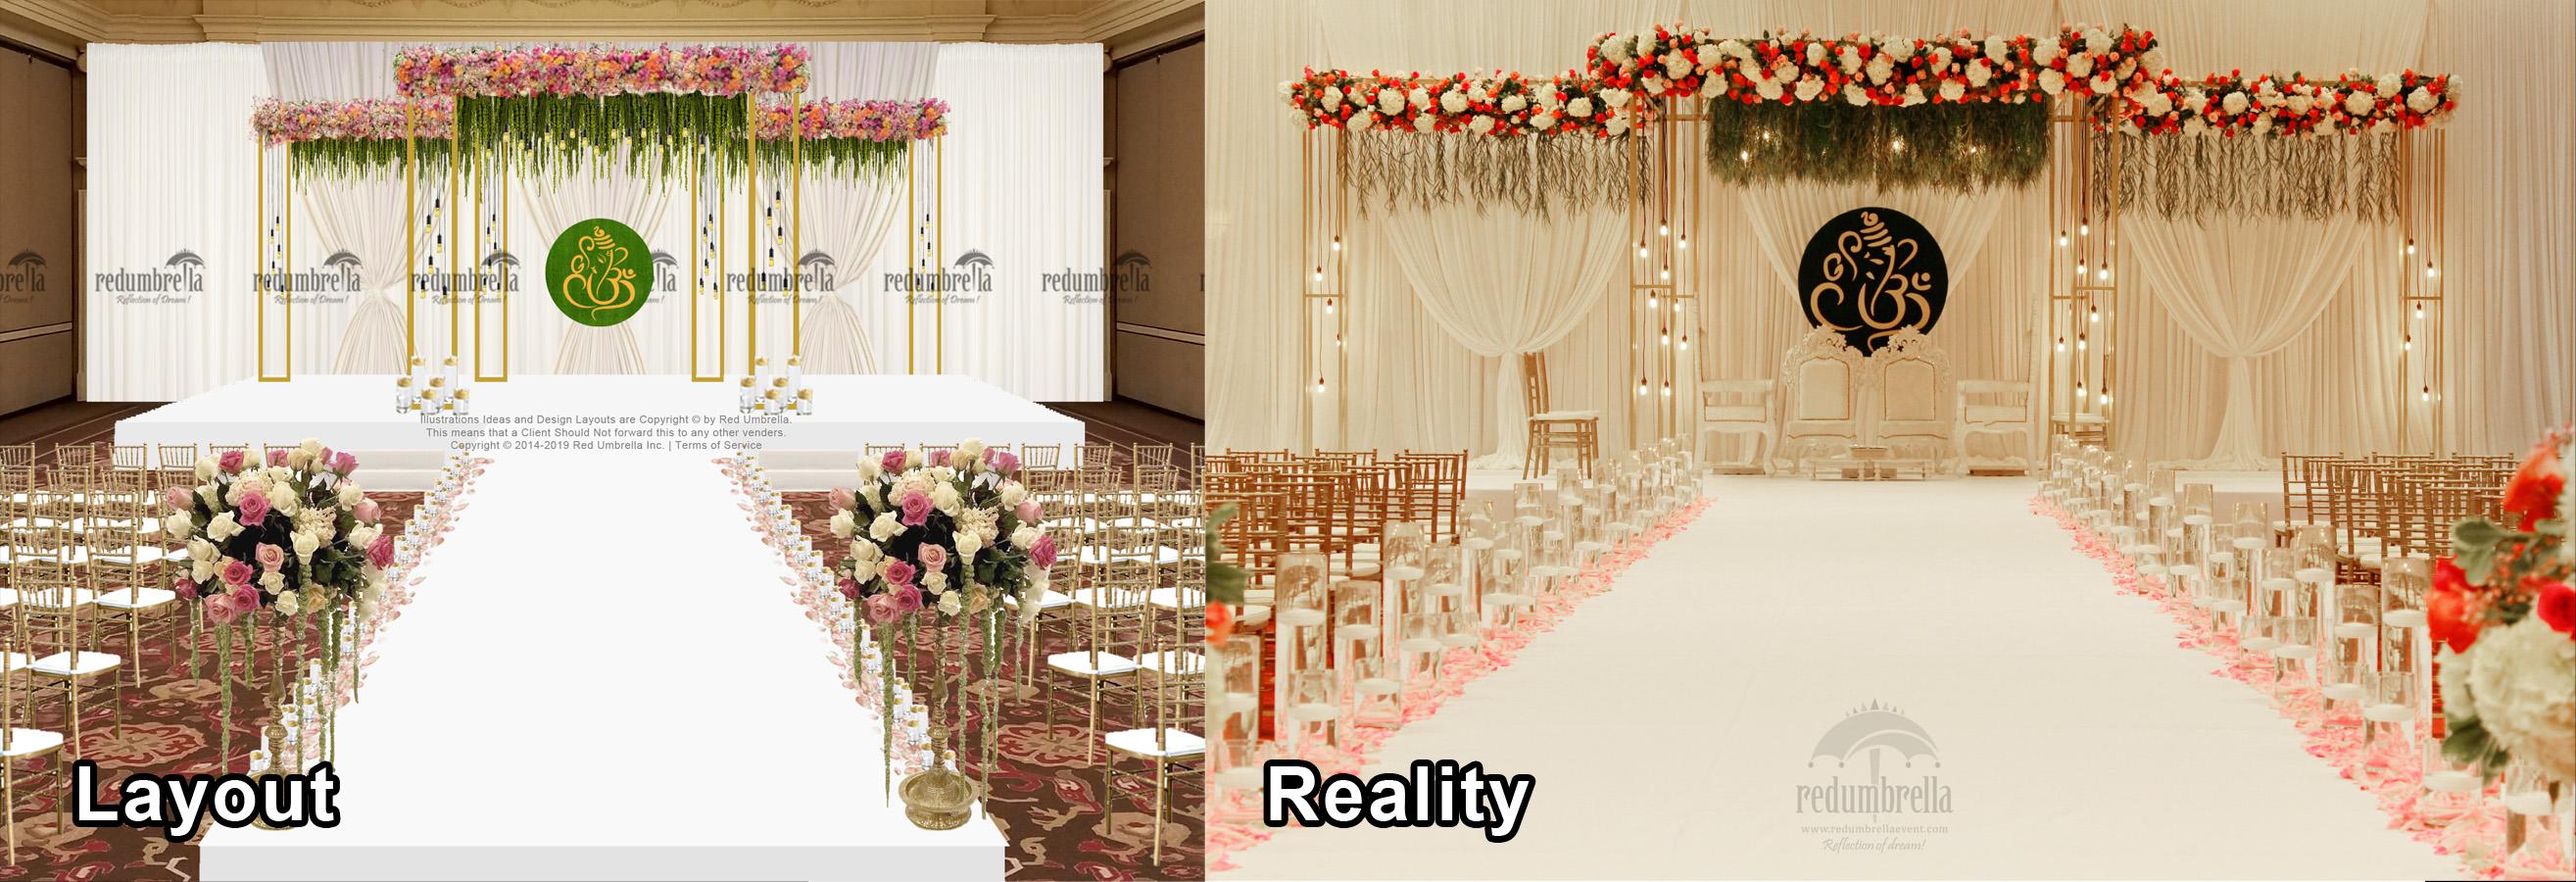 Priya + Arpit wedding LR